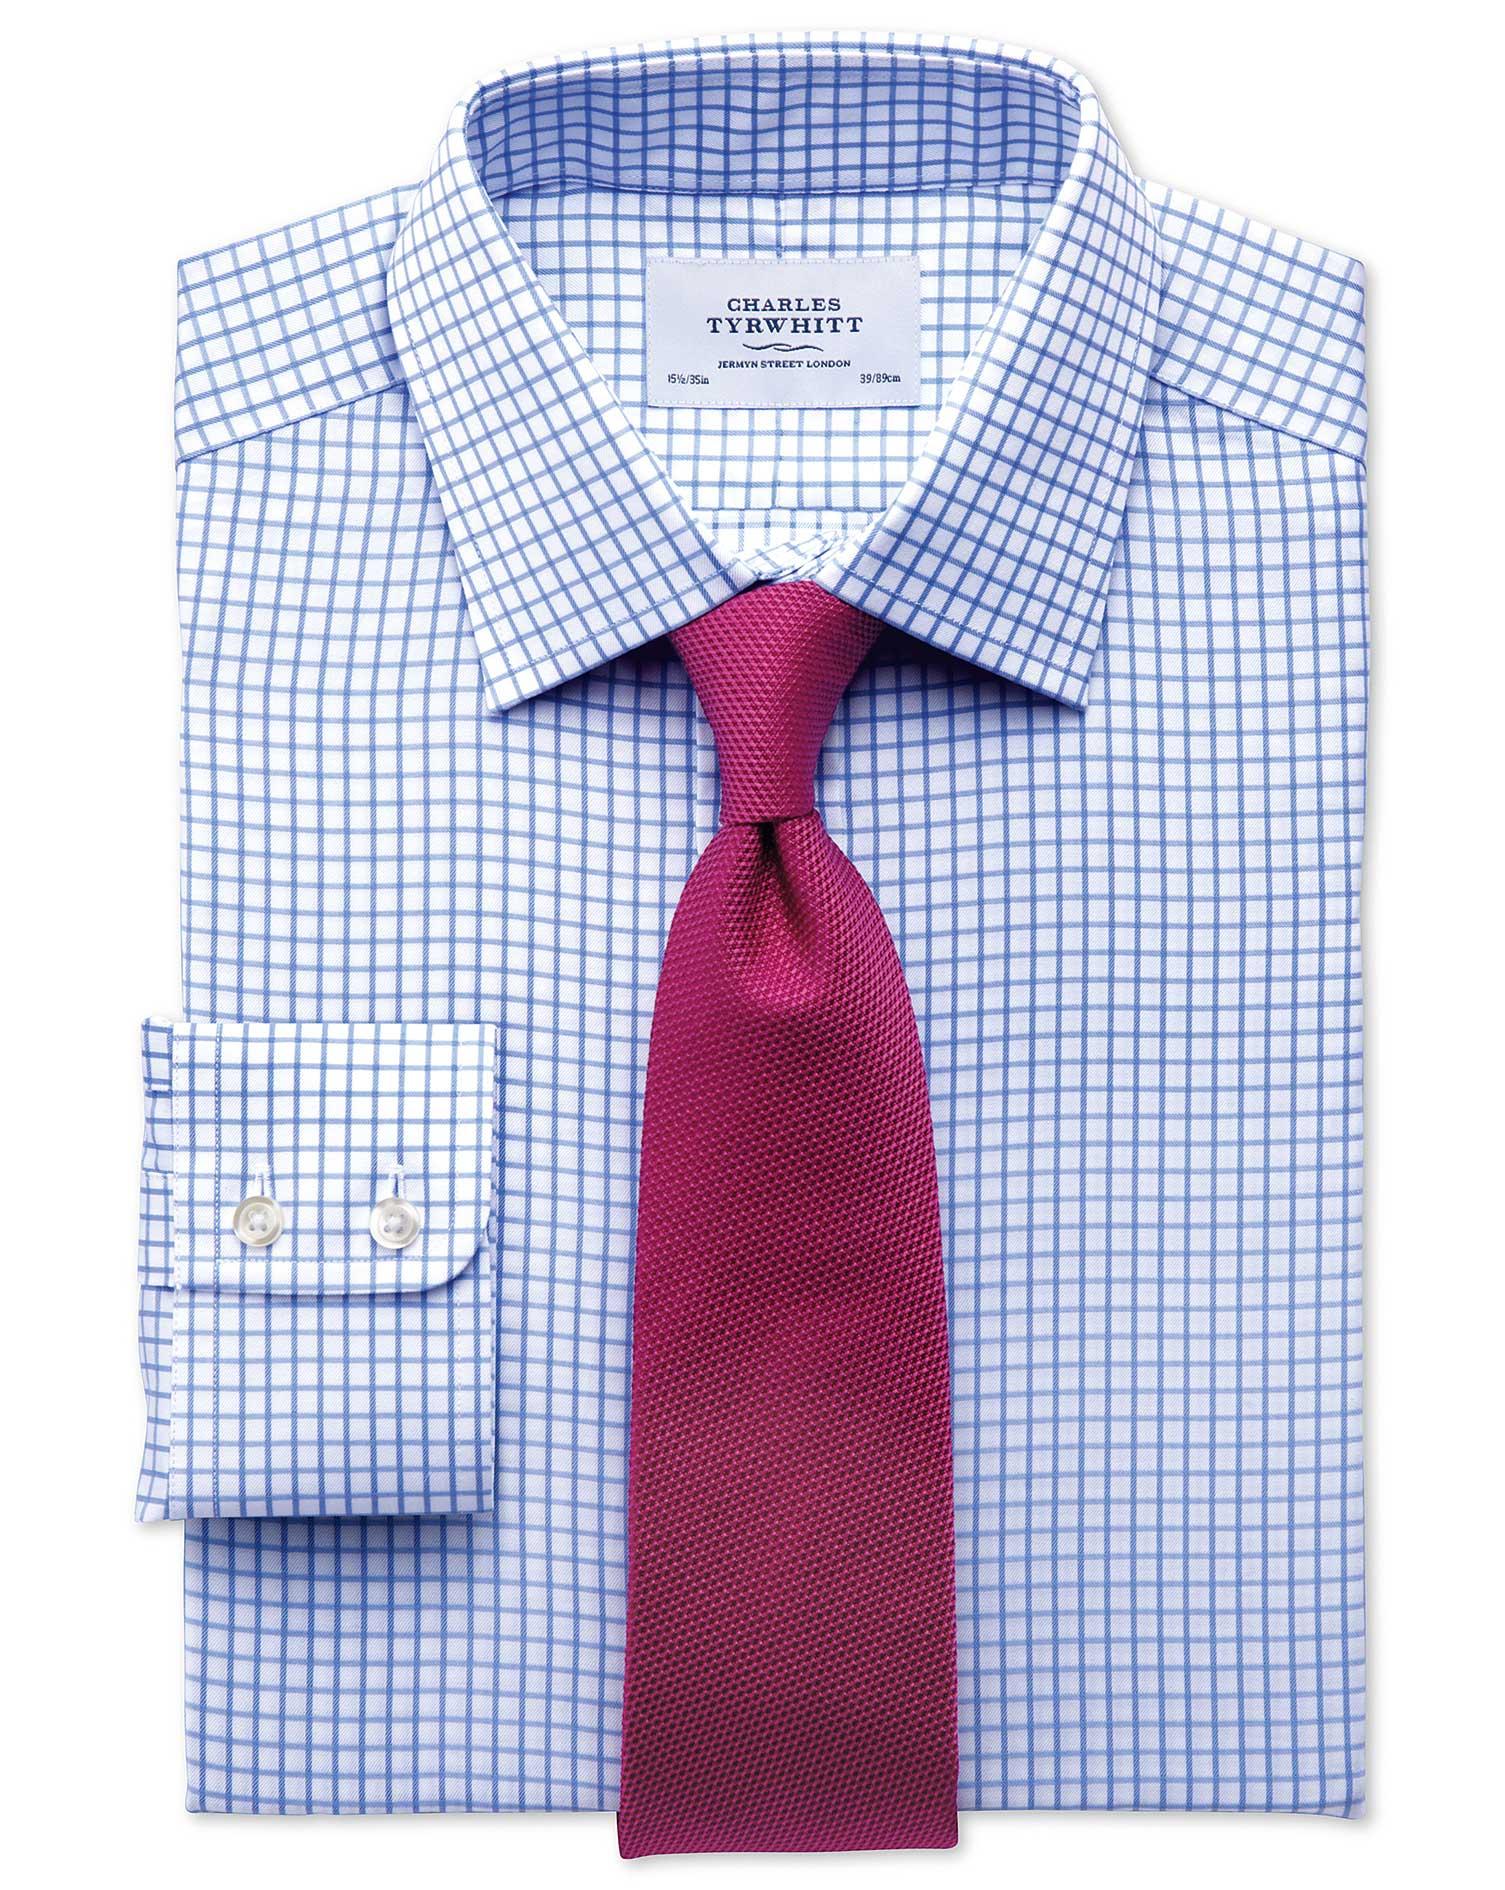 Slim Fit Twill Grid Check Sky Blue Shirt Charles Tyrwhitt